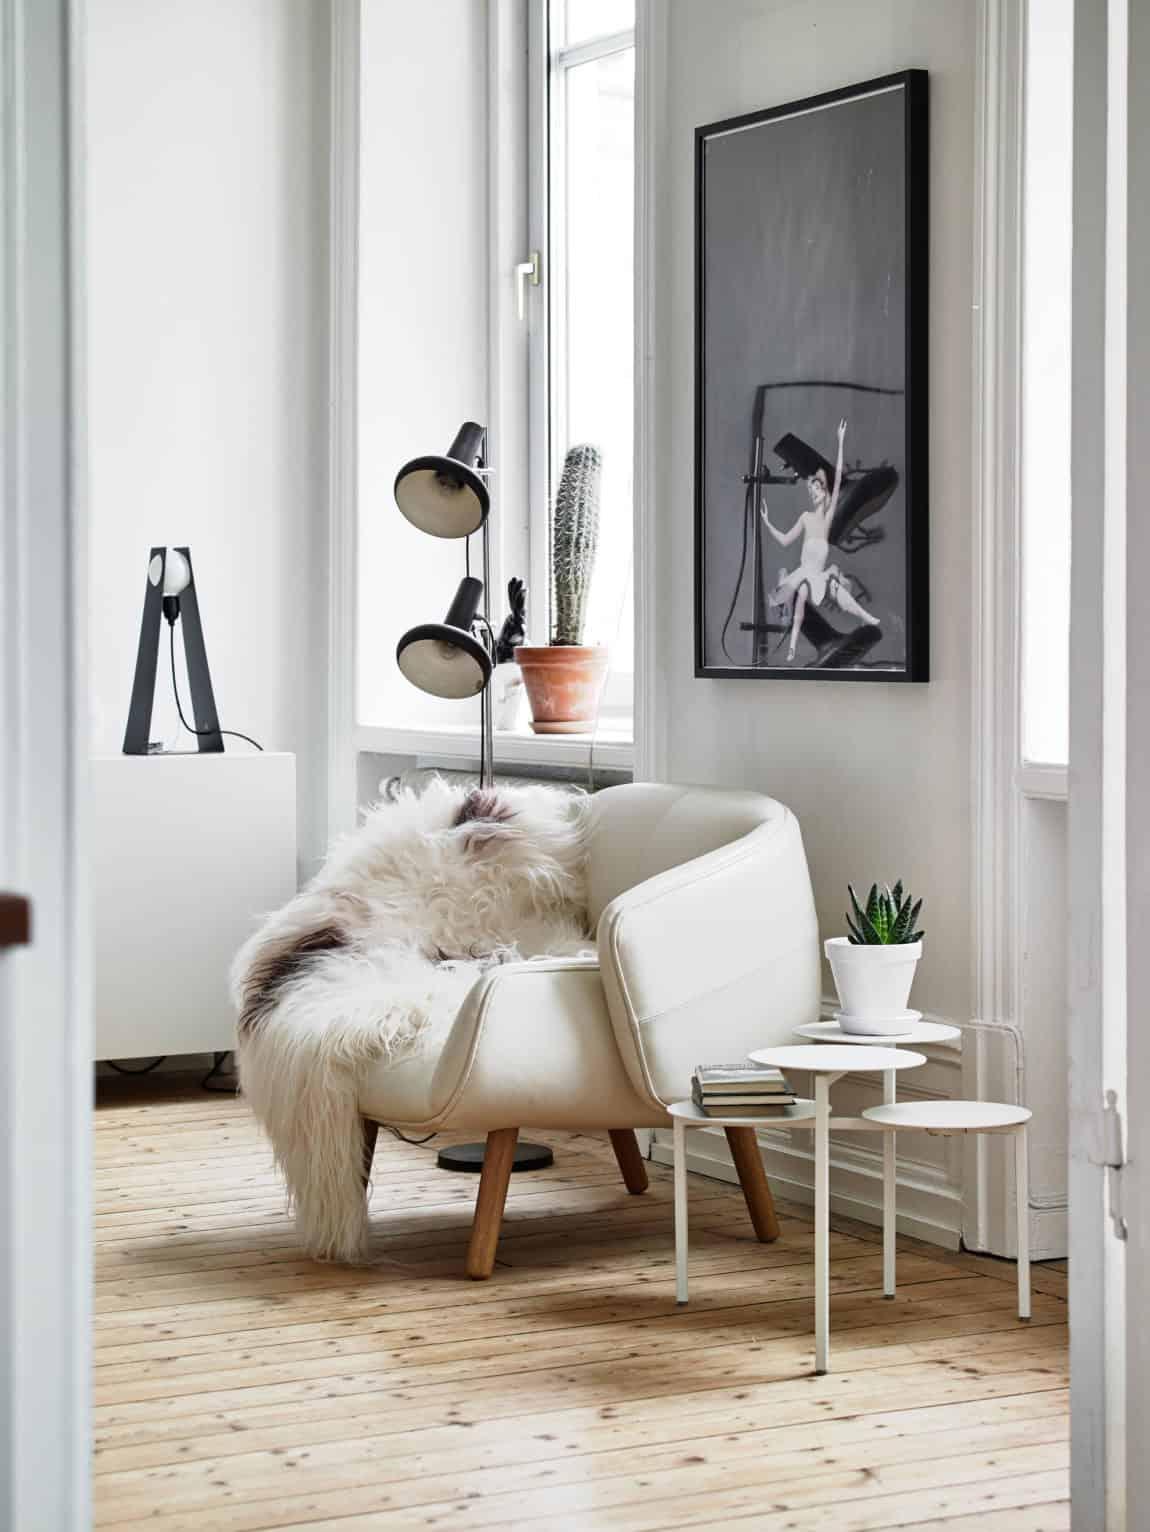 Spacious Apartment Overlooking Skansen Kronan (8)